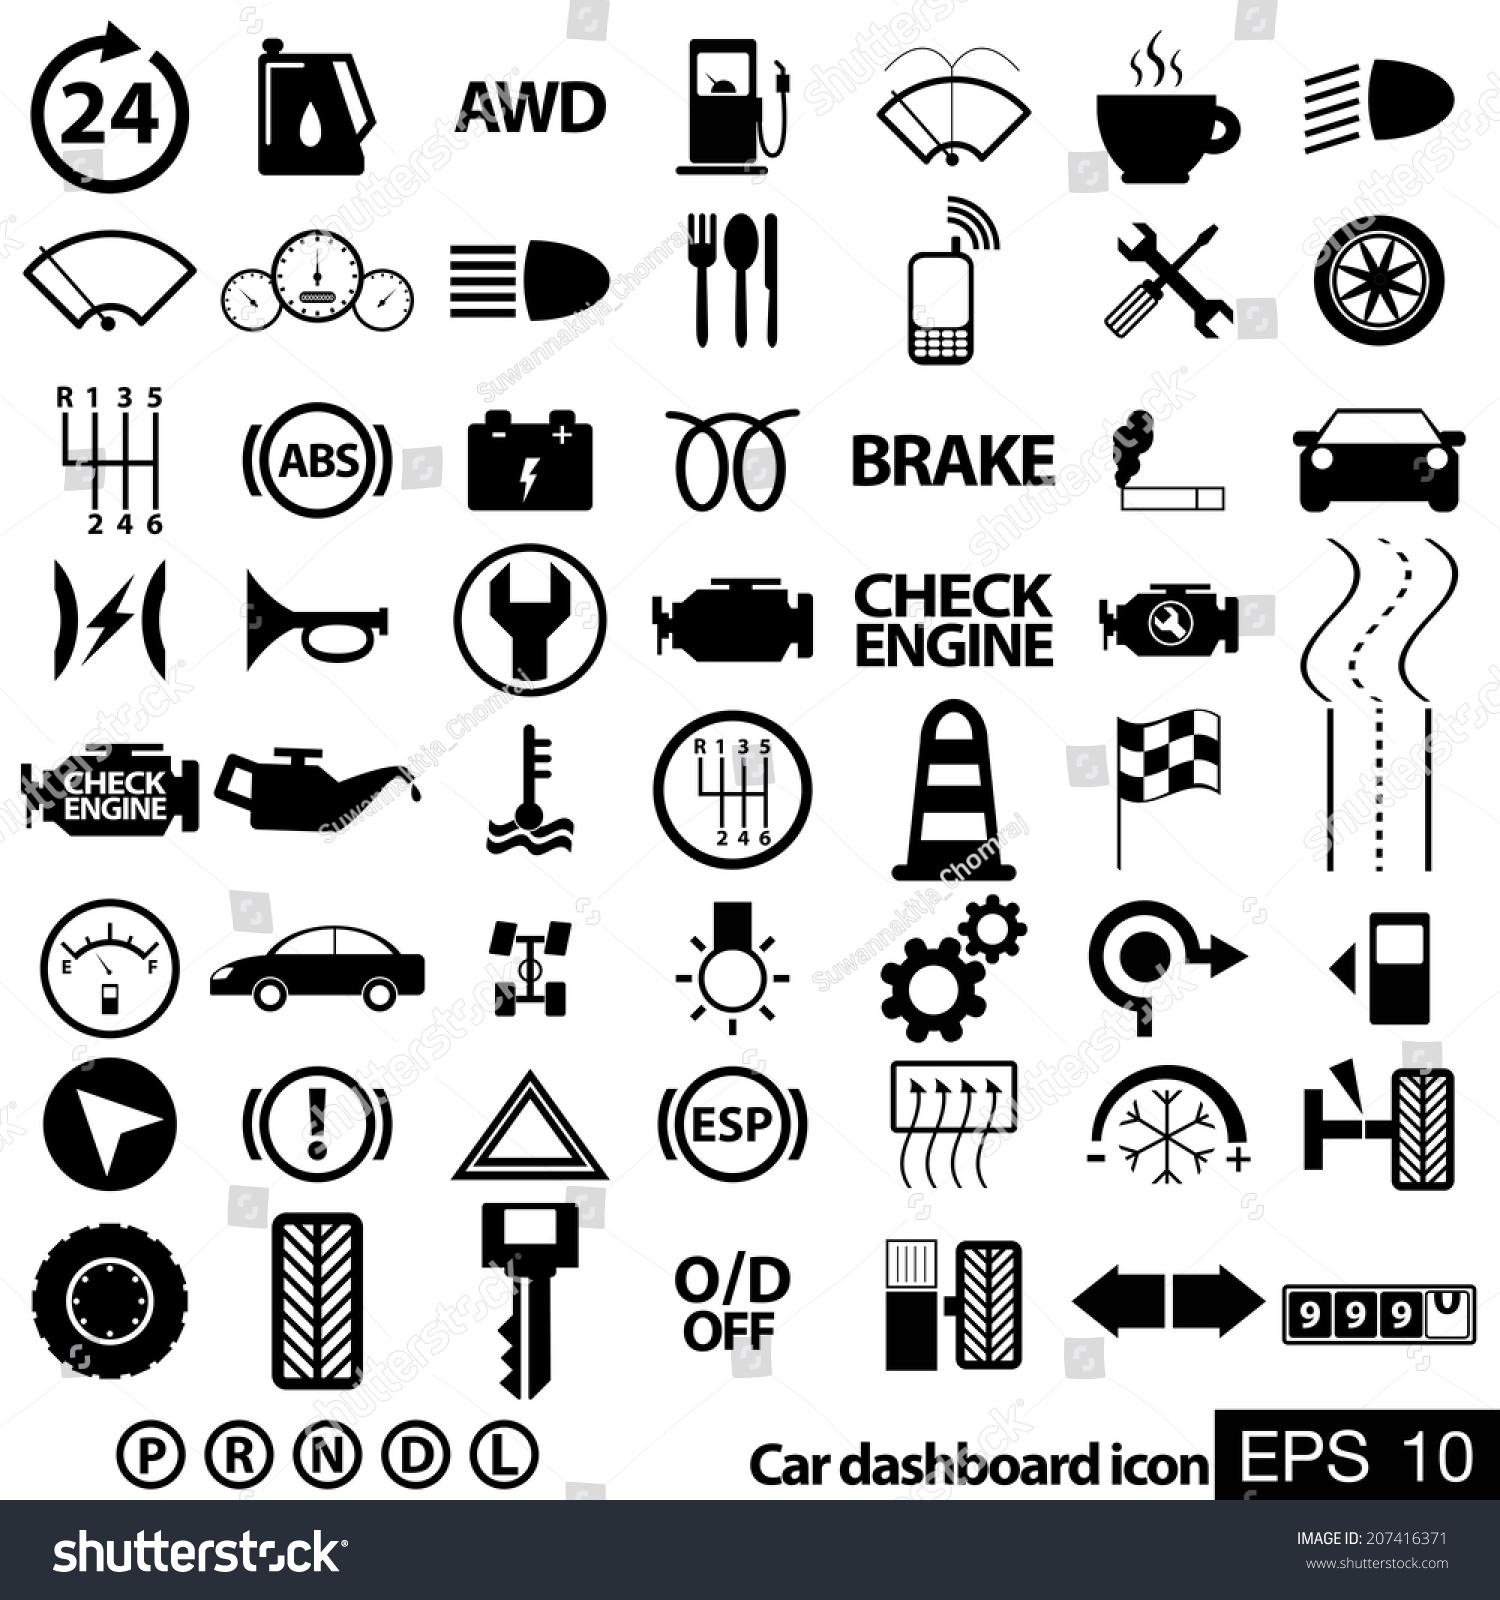 Car Diagram Images Stock Photos amp Vectors  Shutterstock